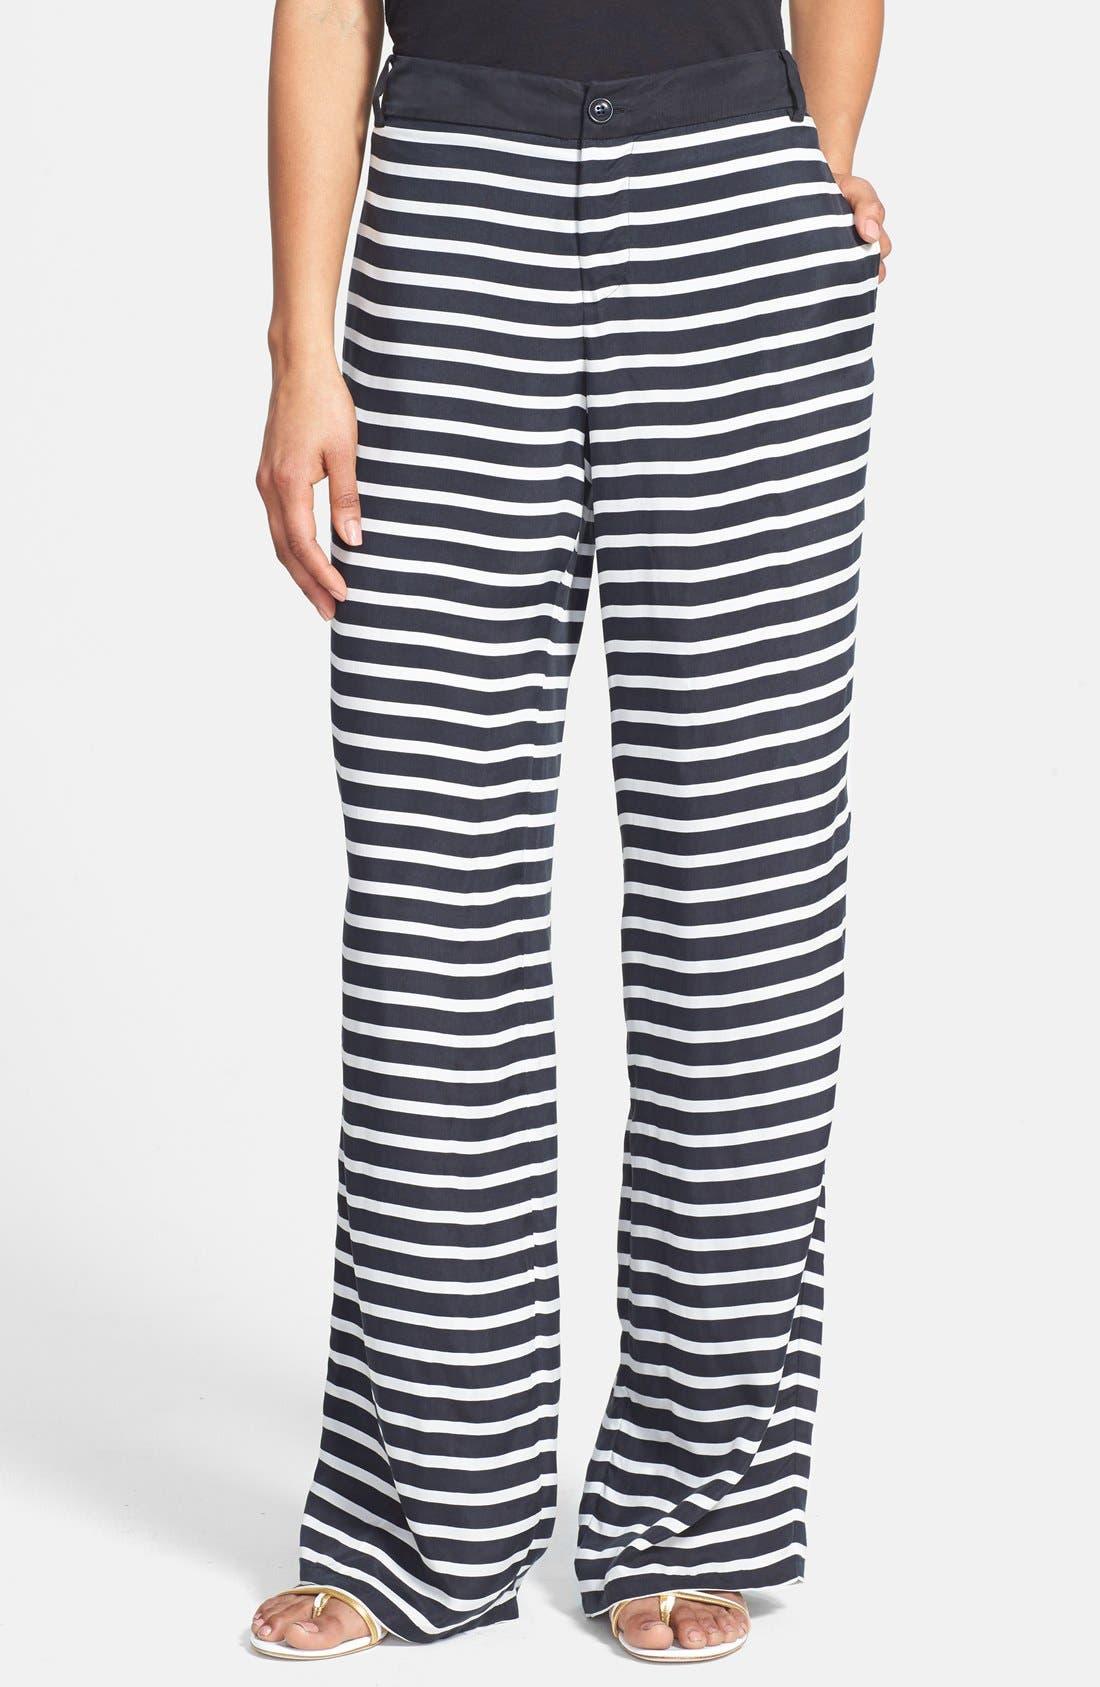 Alternate Image 1 Selected - Weekend Max Mara 'Rosalba' Stripe Pants